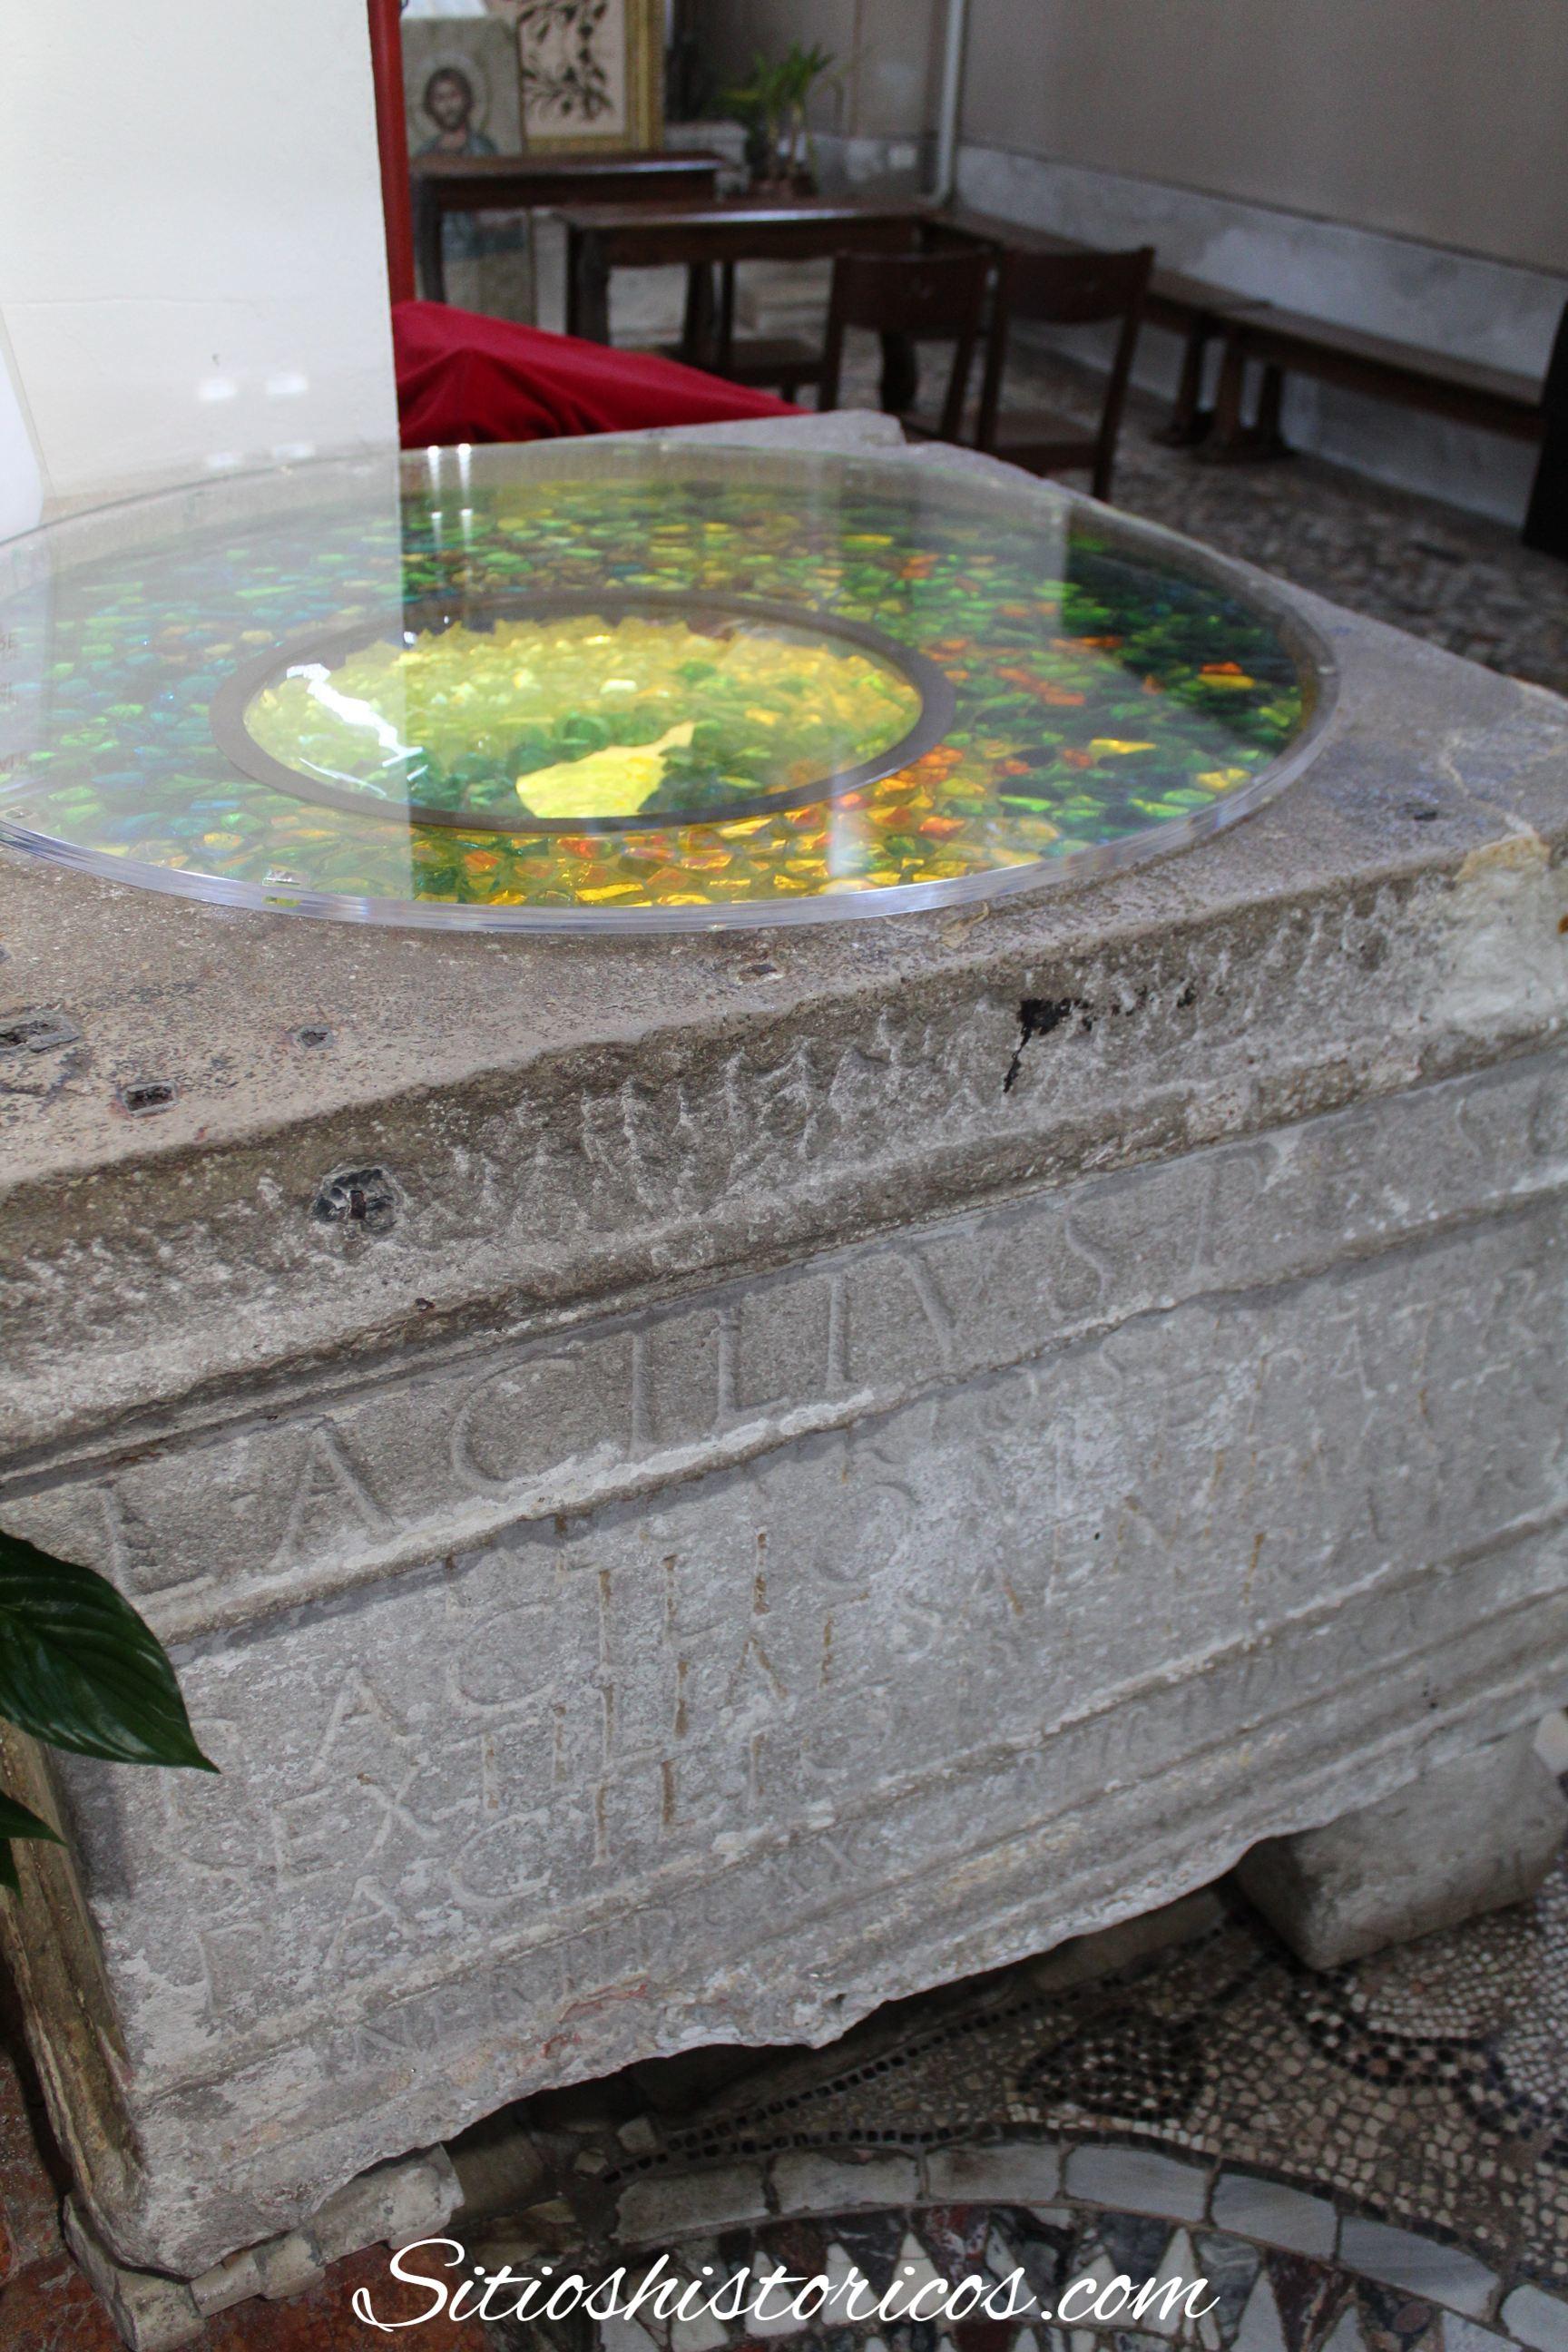 Pila bautismal cristal Murano